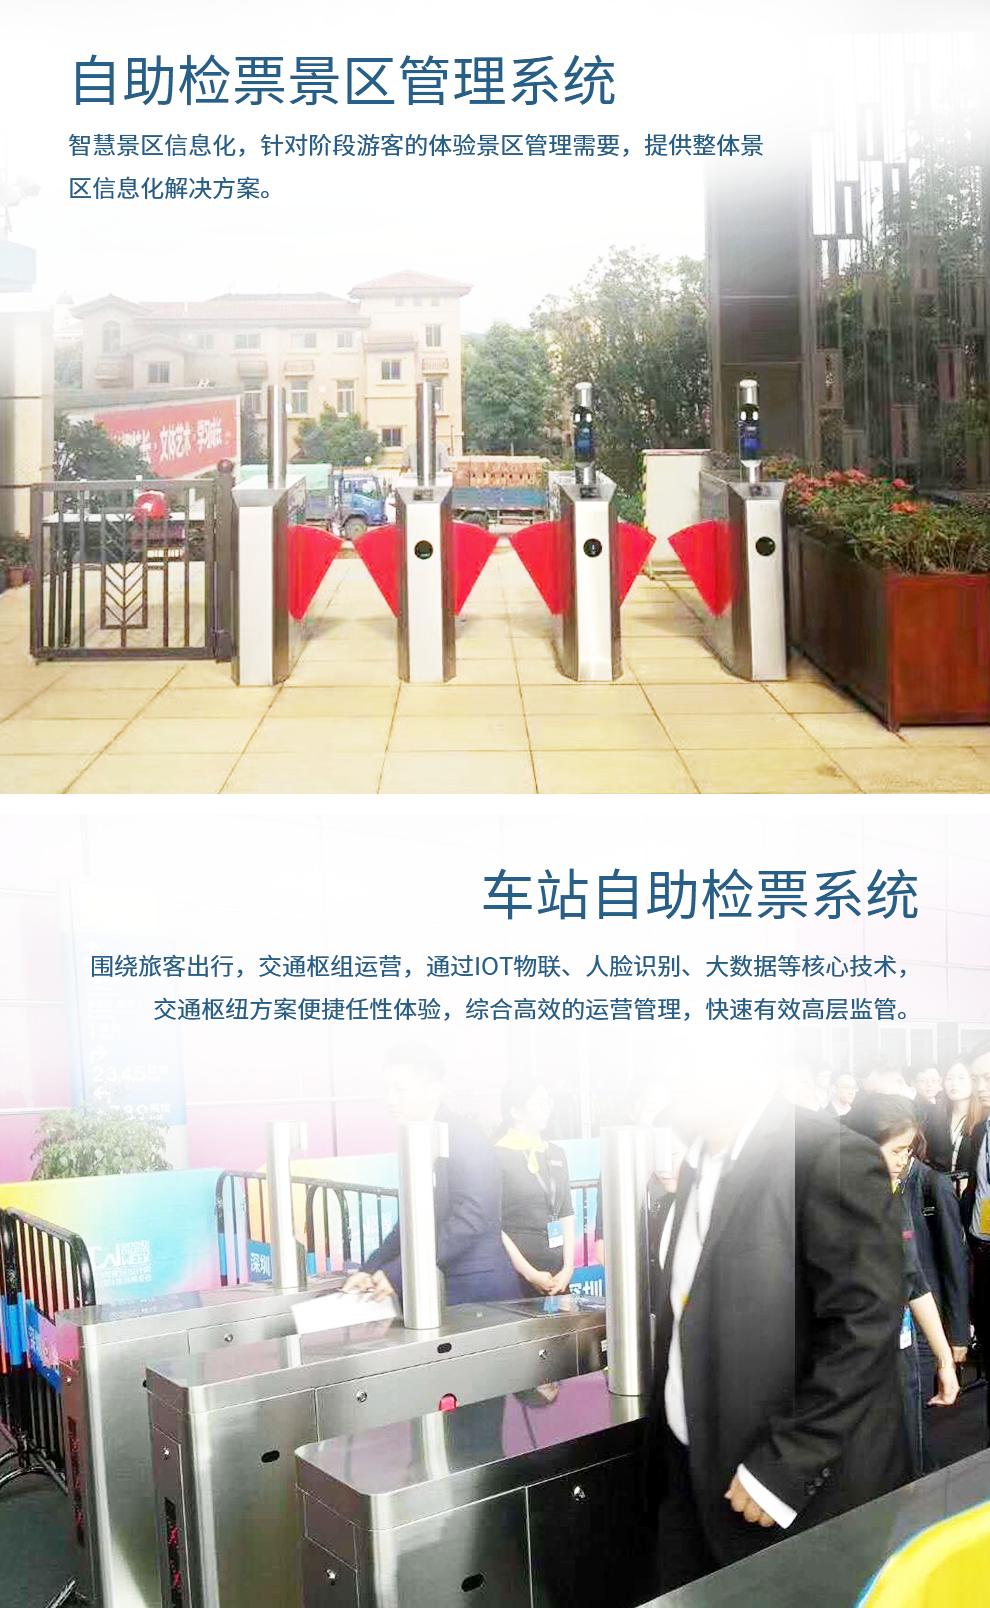 YJ1703人臉識別_10.png